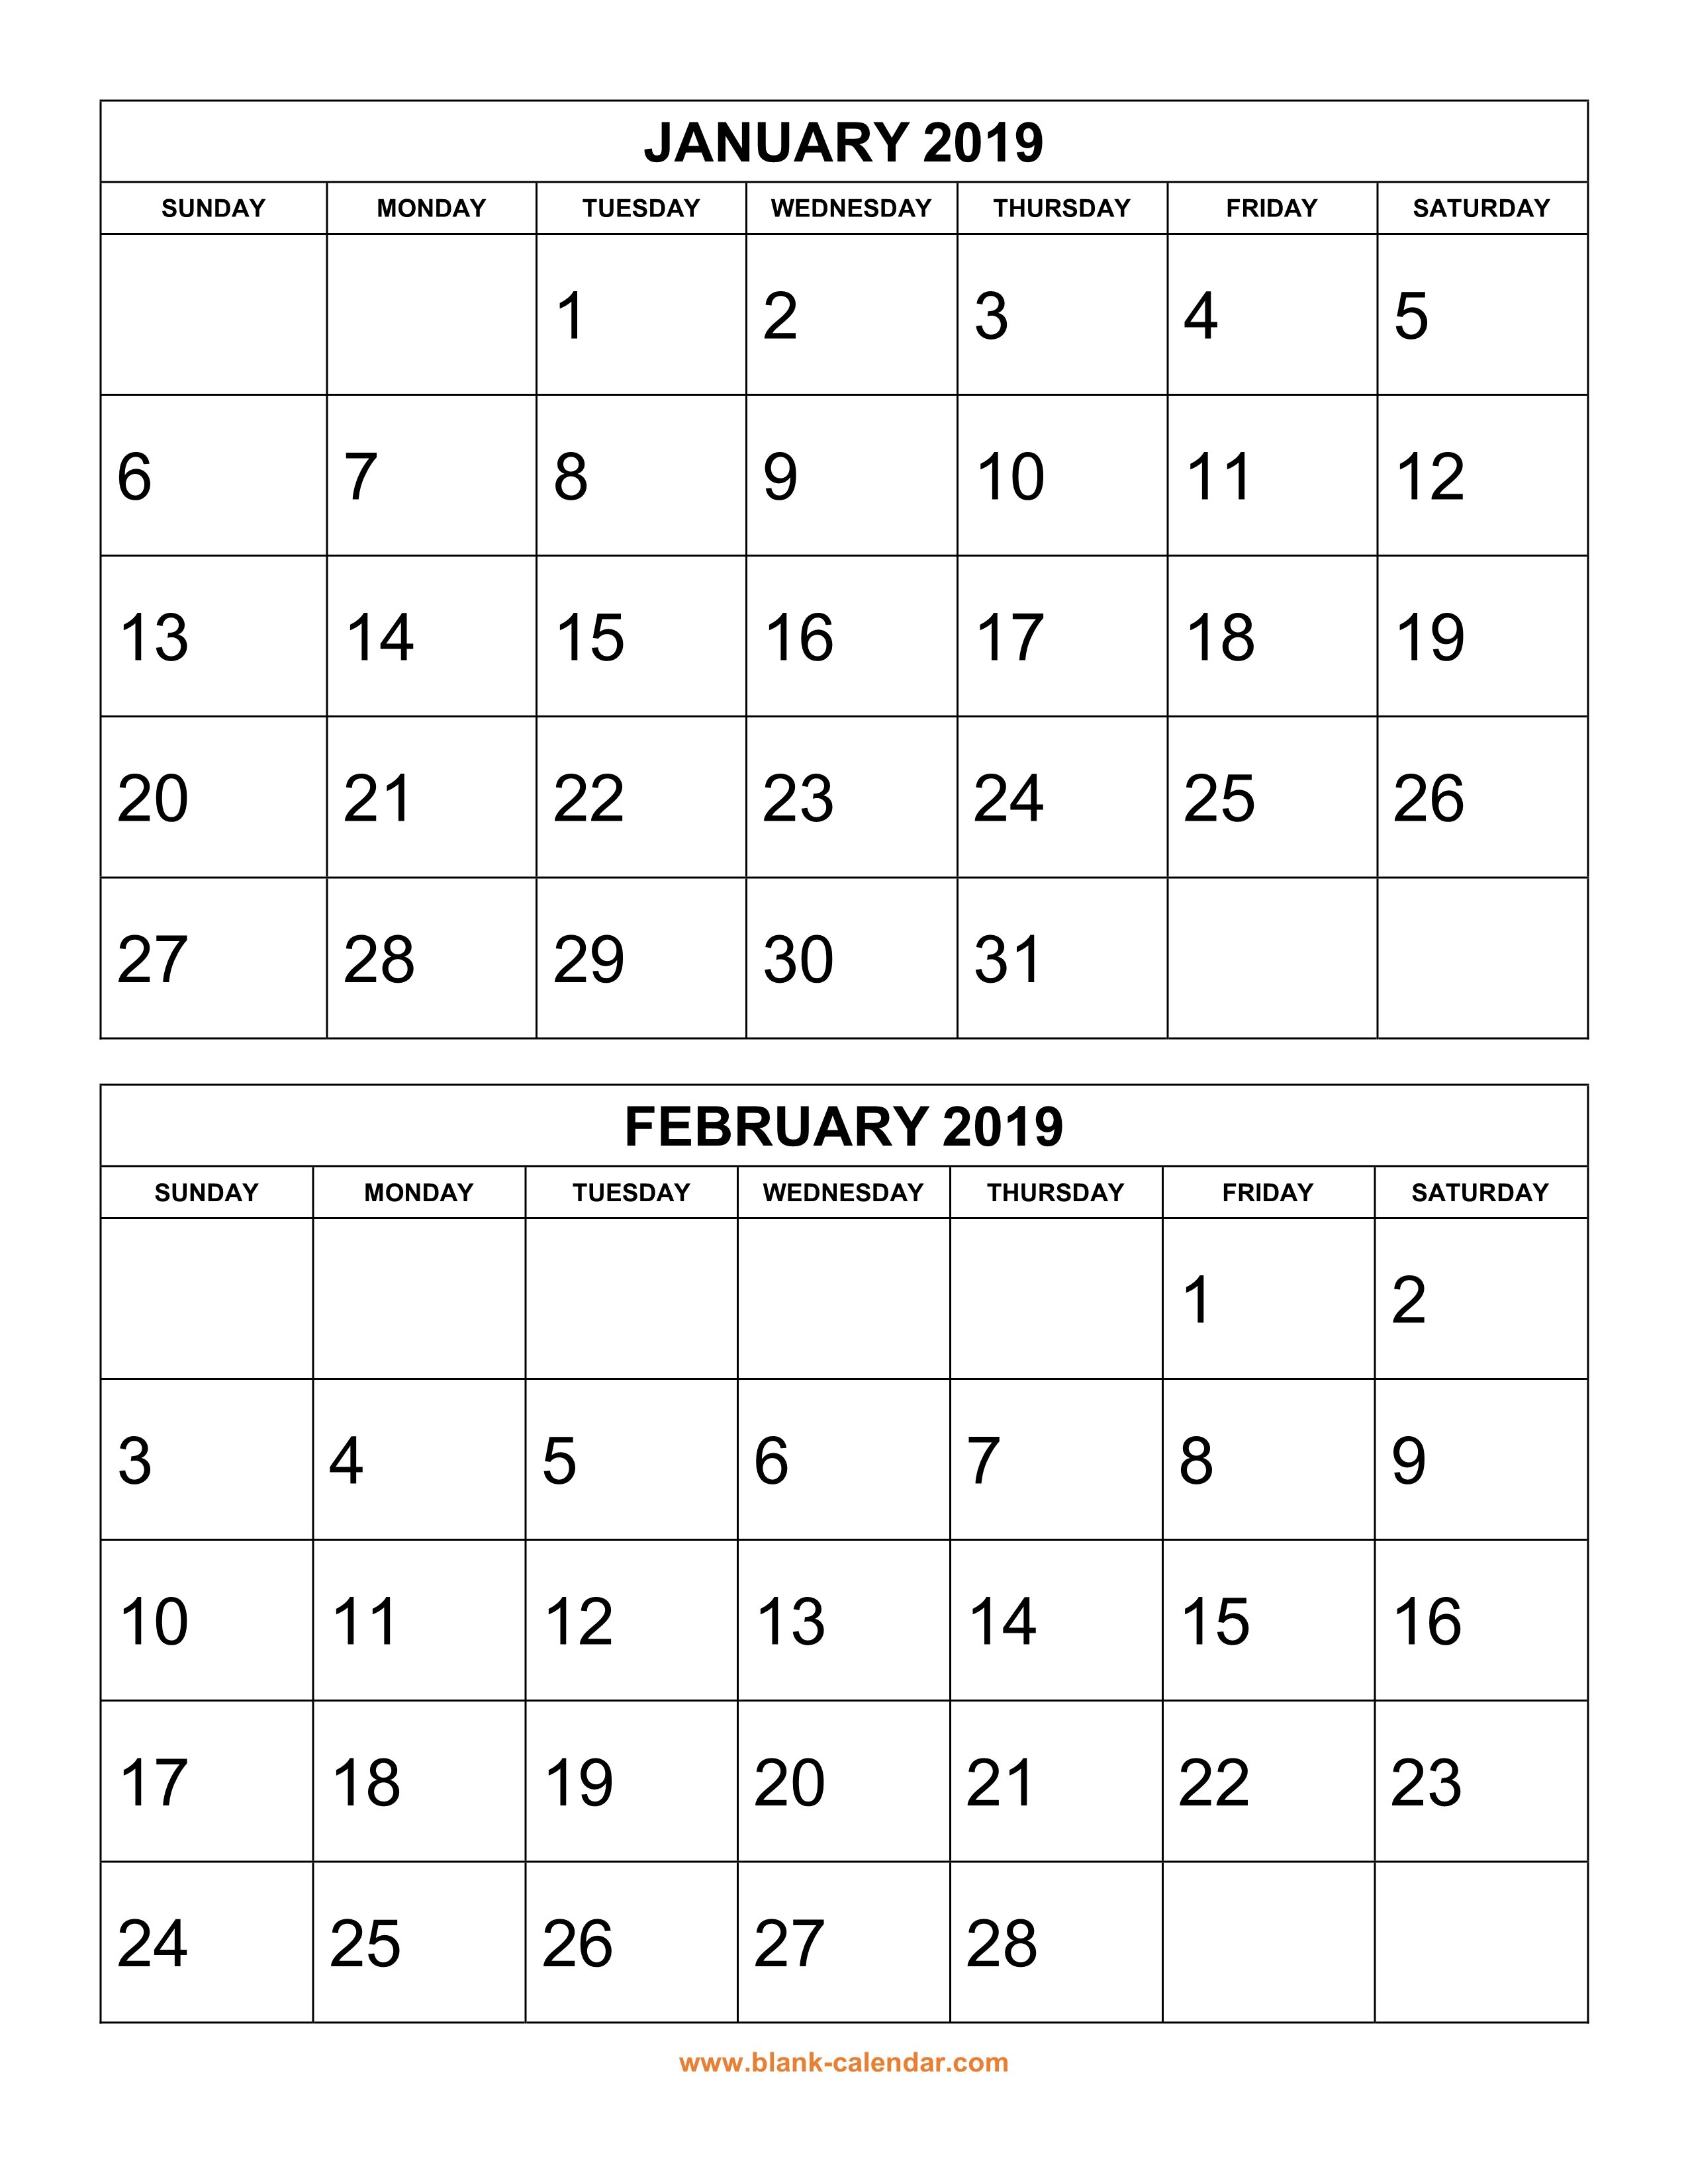 Free Download Printable Calendar 2019, 2 Months Per Page, 6 Pages 2019 Calendar 6 Months Per Page